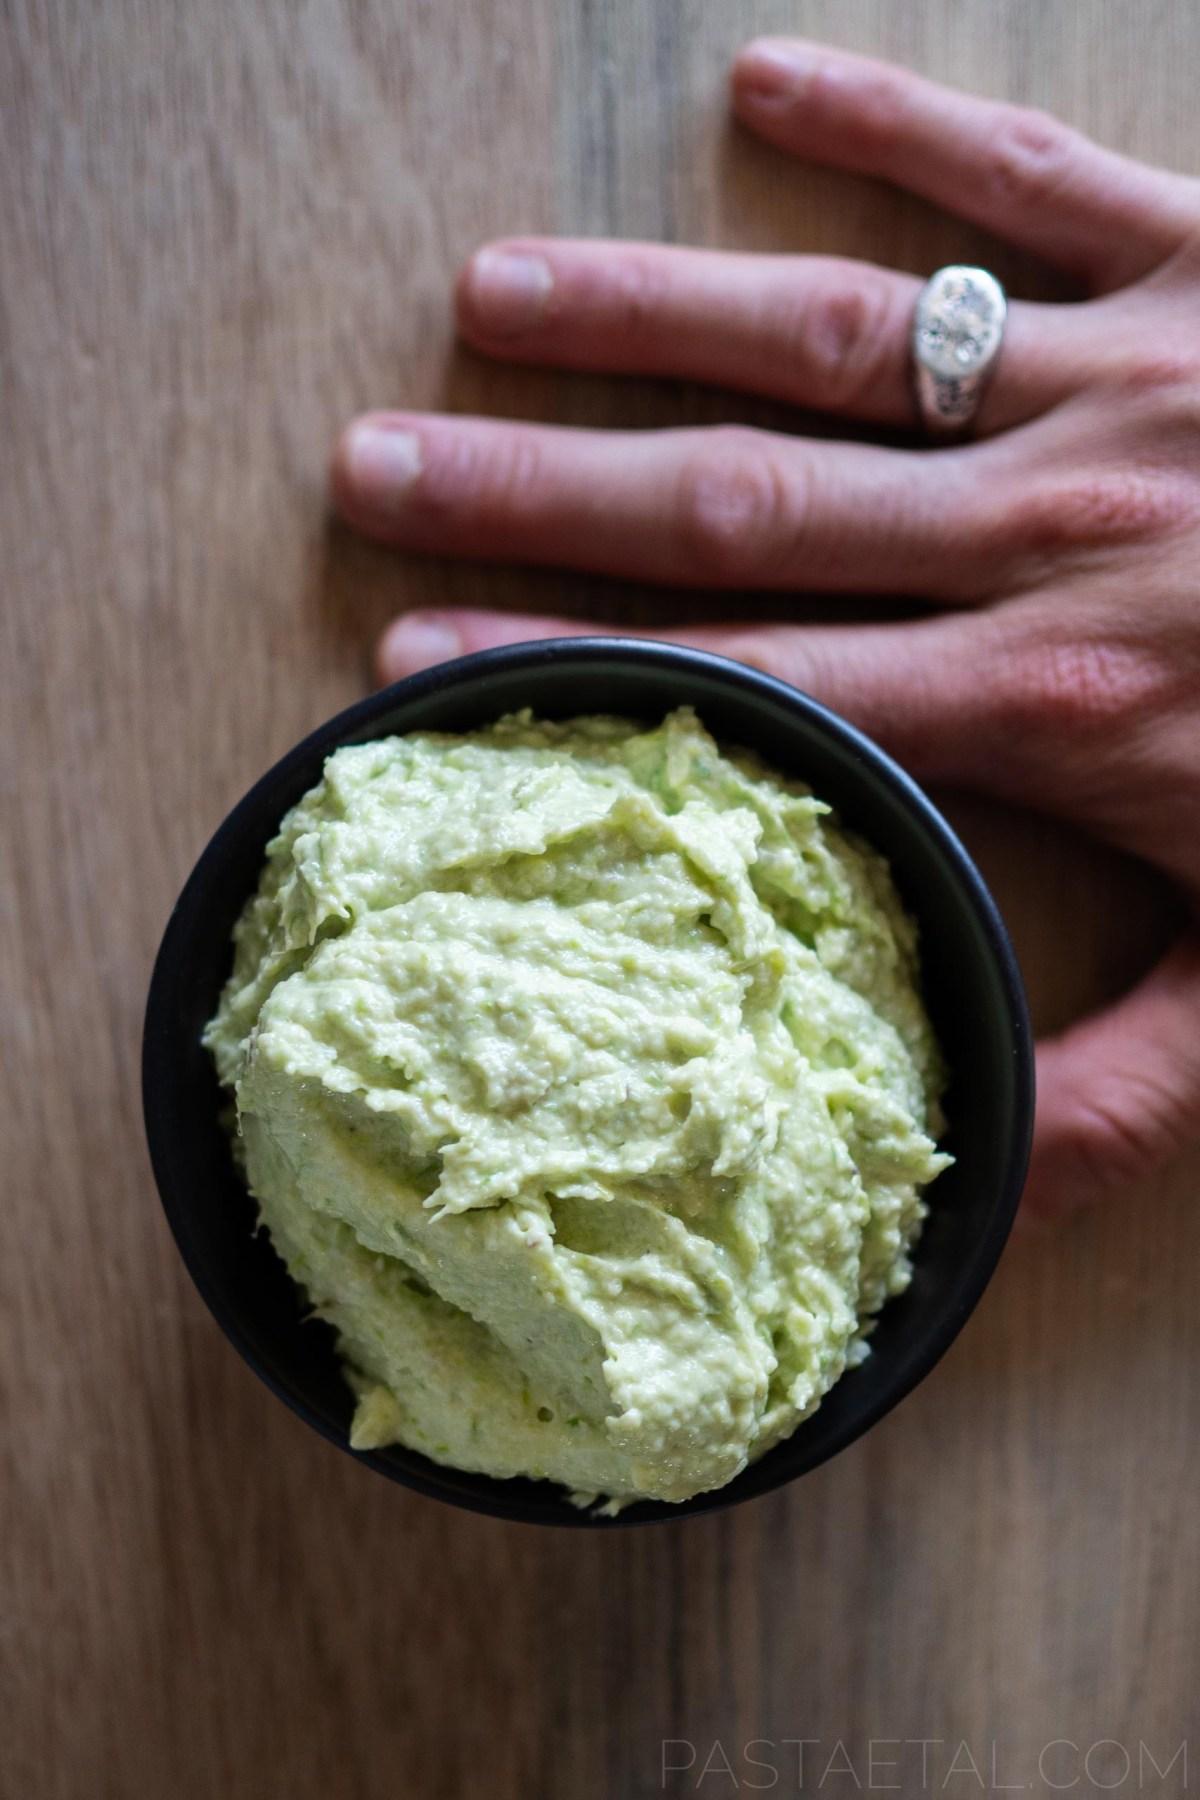 blended mascarpone and asparagus